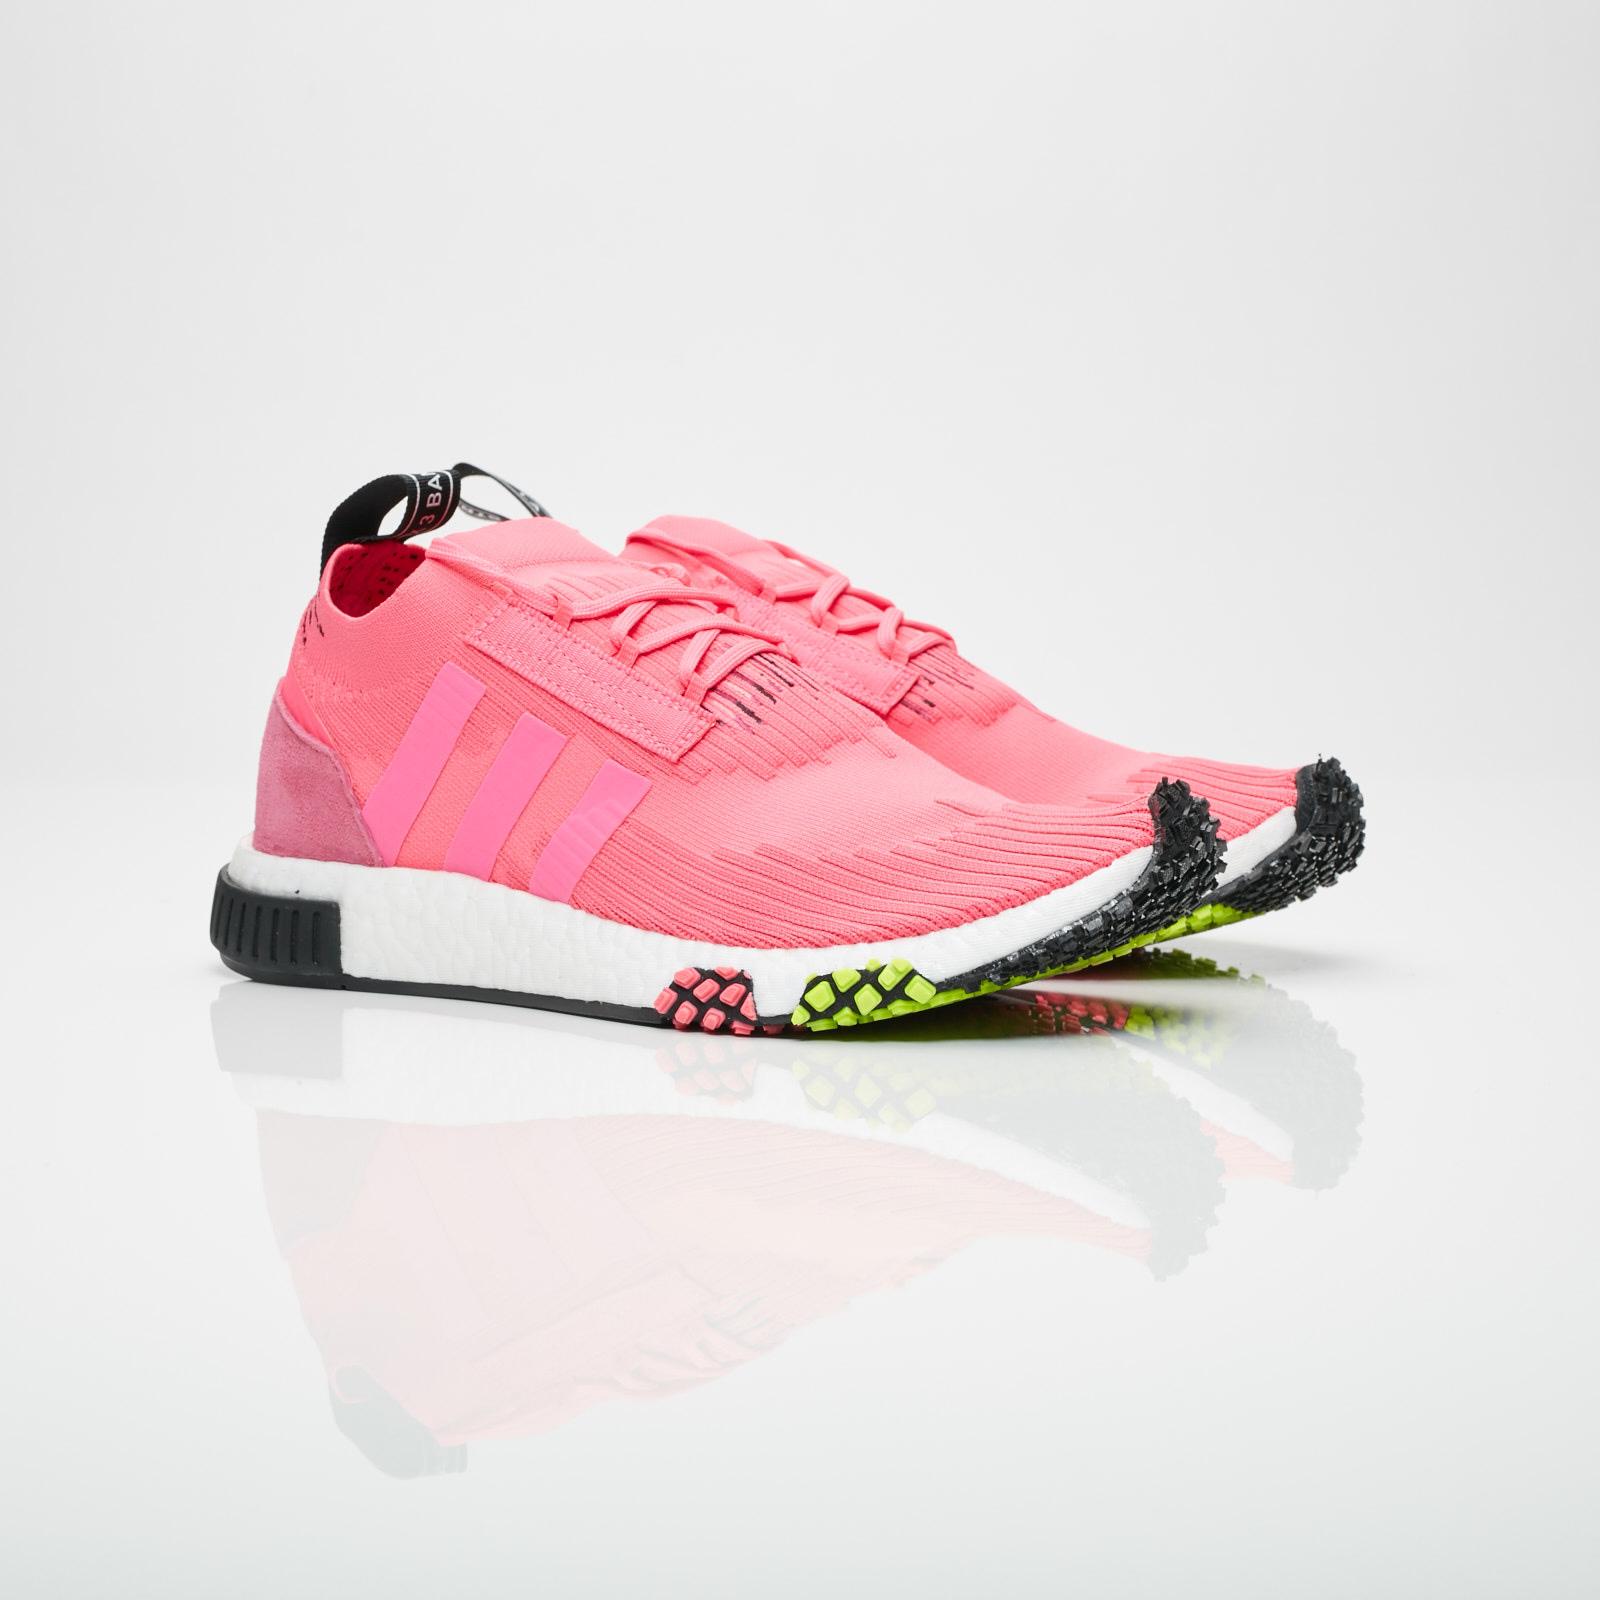 ce3f8d617433 adidas NMD Racer PK - Cq2442 - Sneakersnstuff